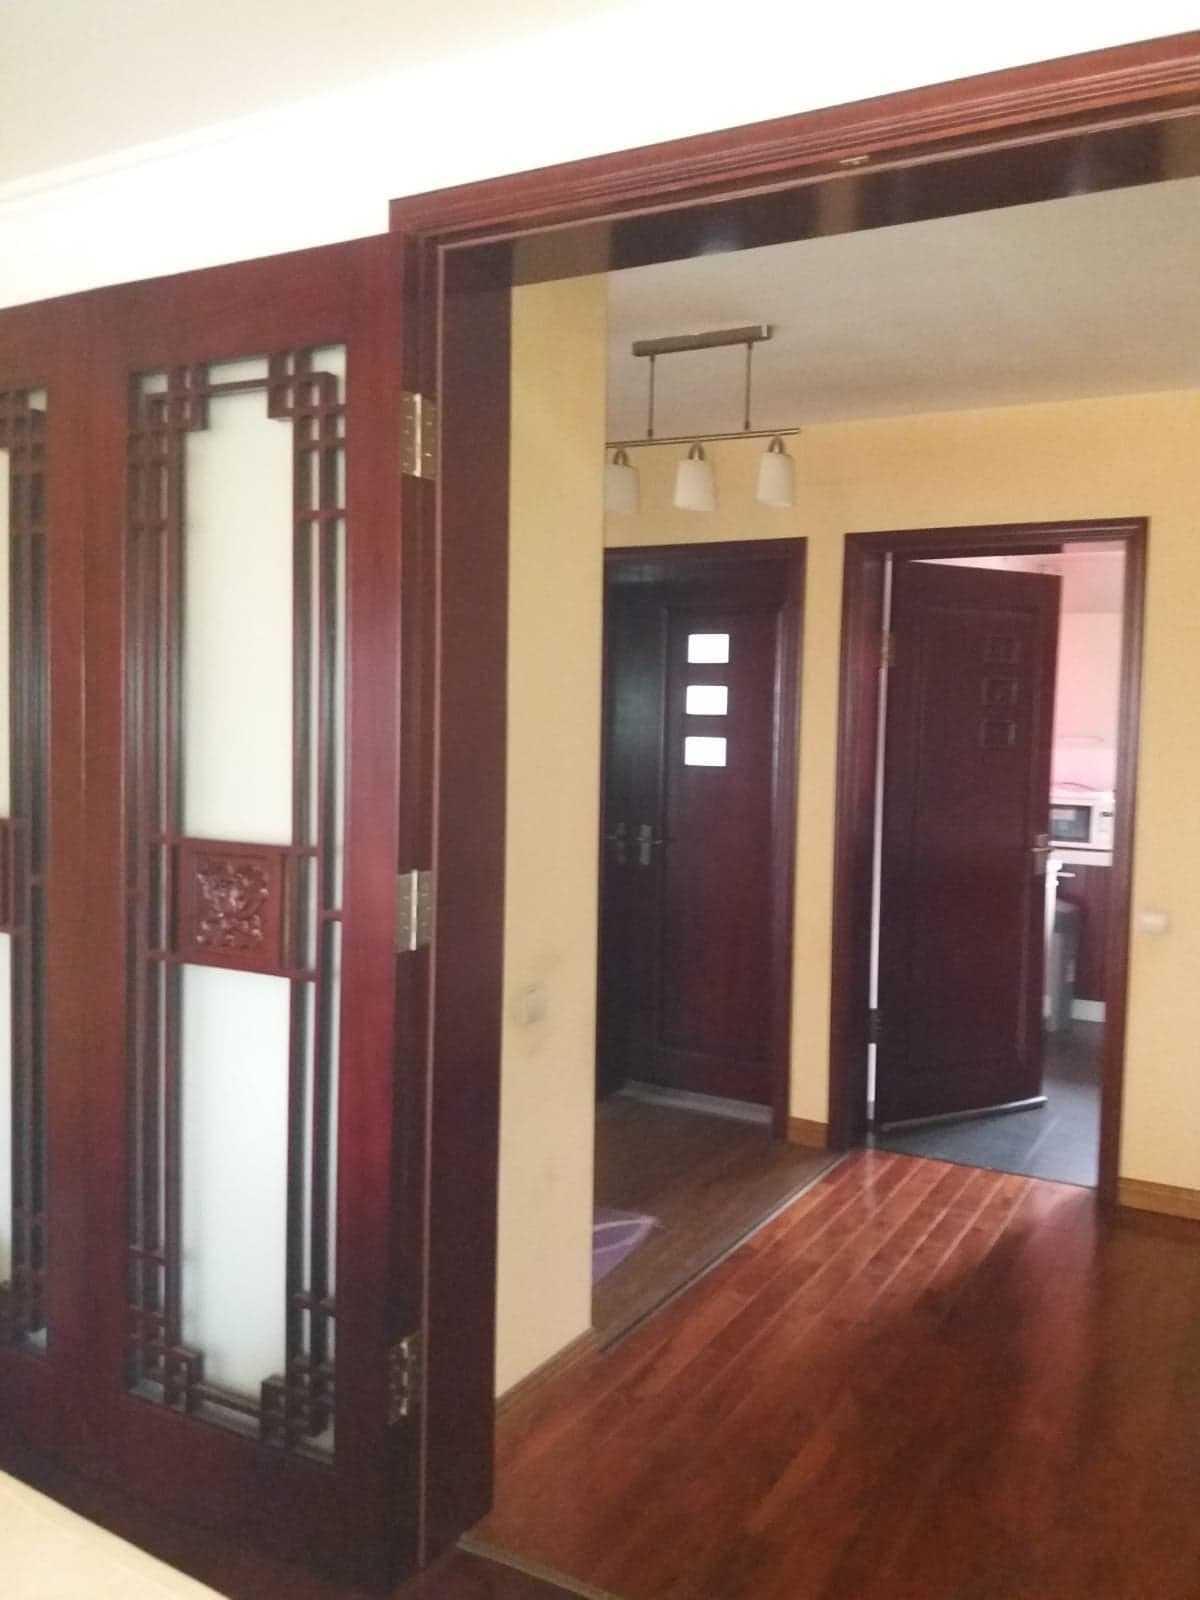 Room renovation handyman